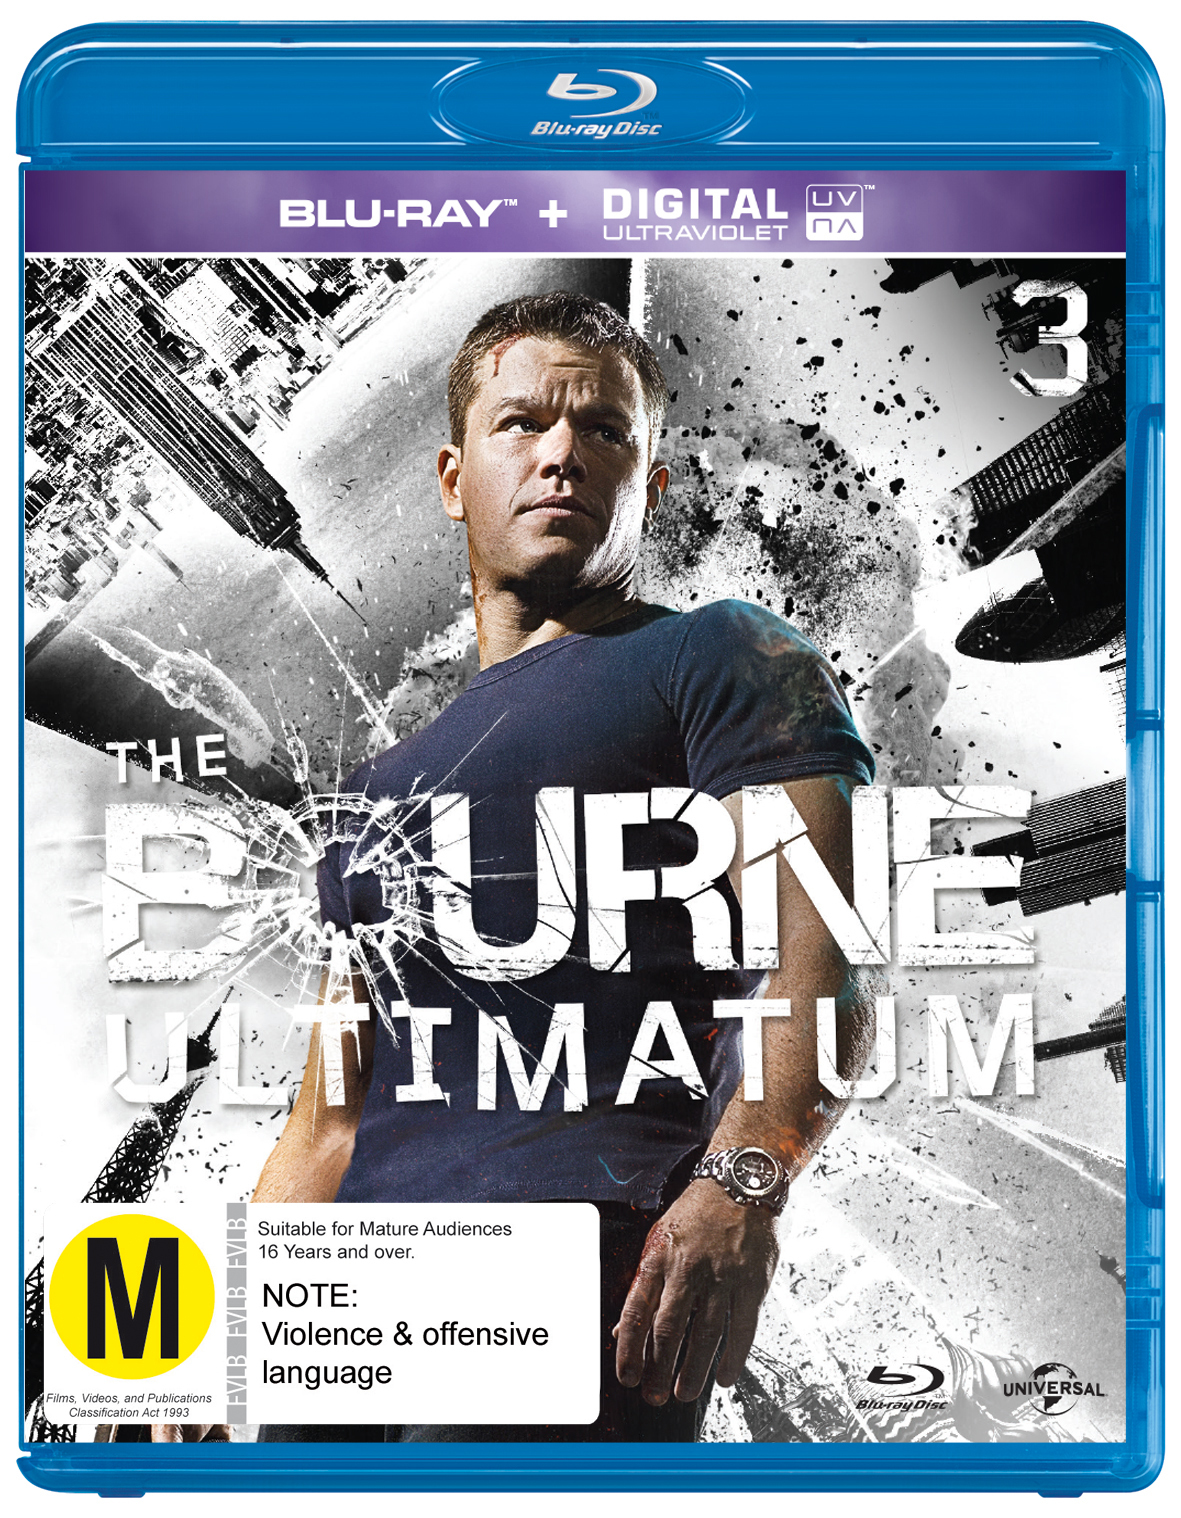 The Bourne Ultimatum on Blu-ray, UV image